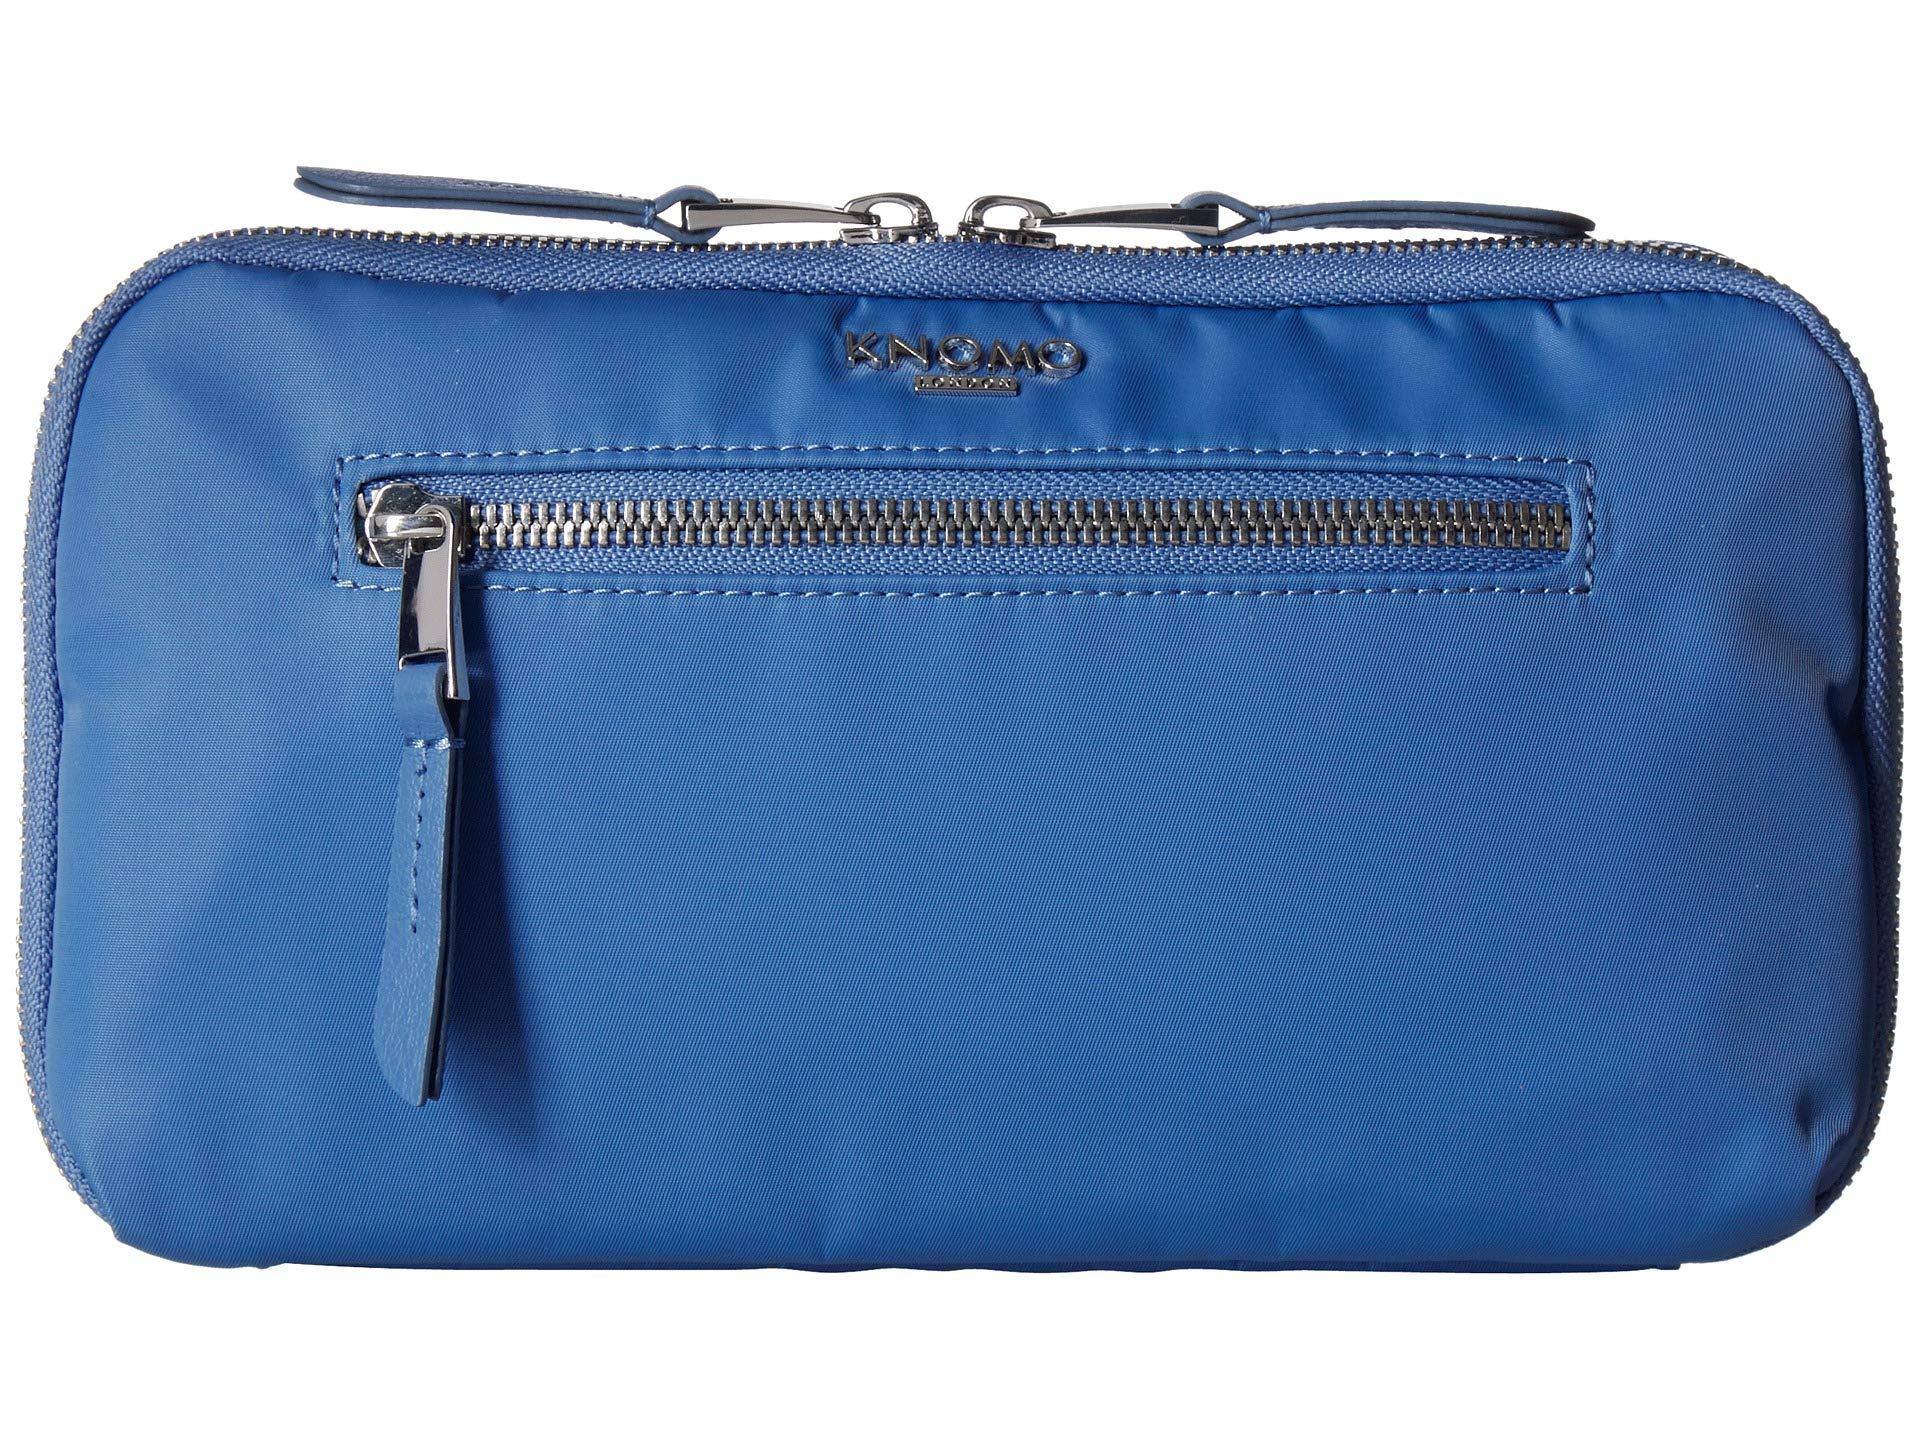 KNOMO London Unisex Knomad Travel Wallet Cornflower Blue One Size by Knomo